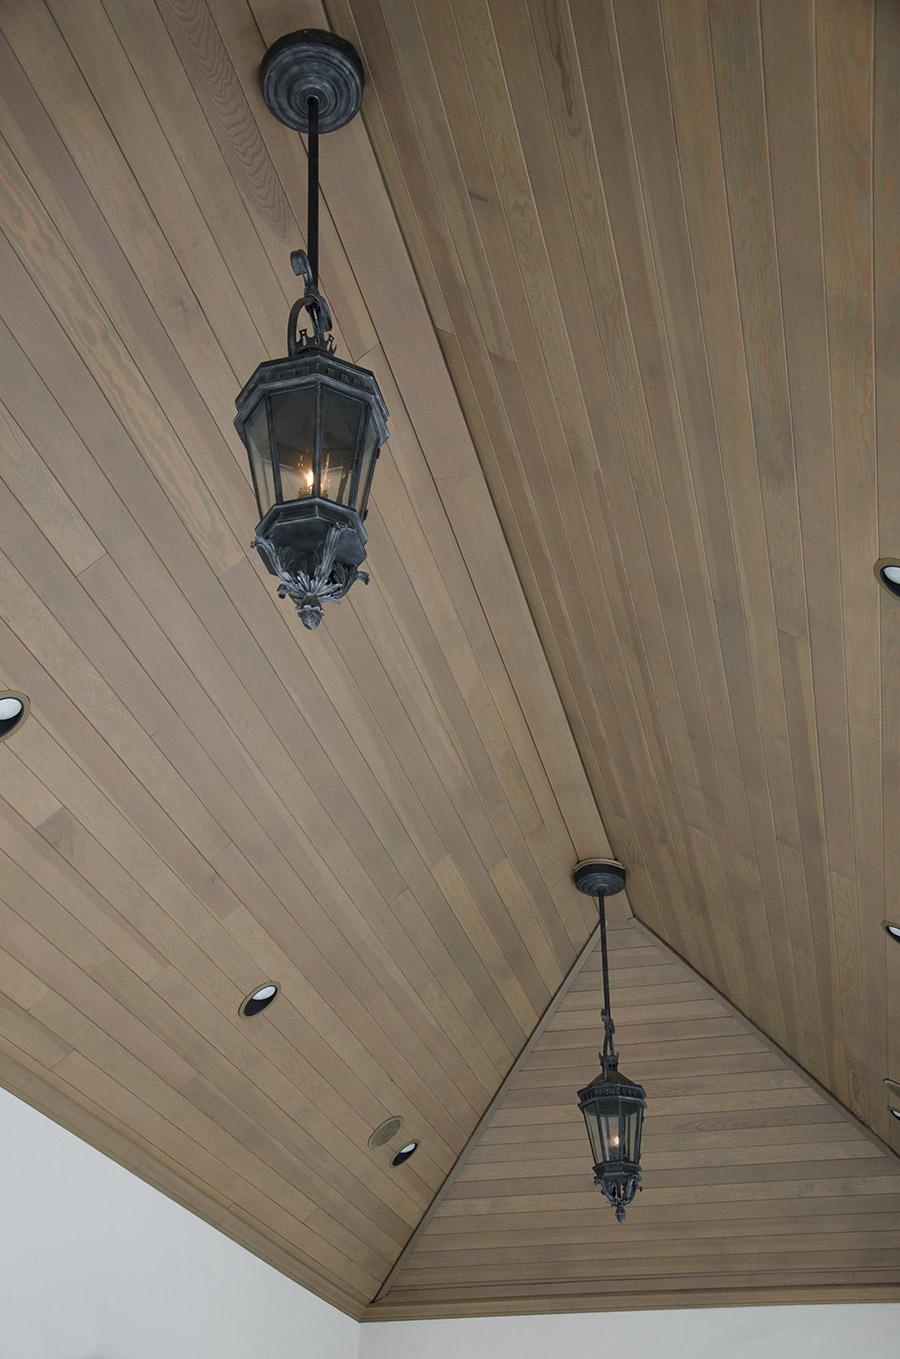 solara-custom-classic-steel-outdoor-lighting-lucerna